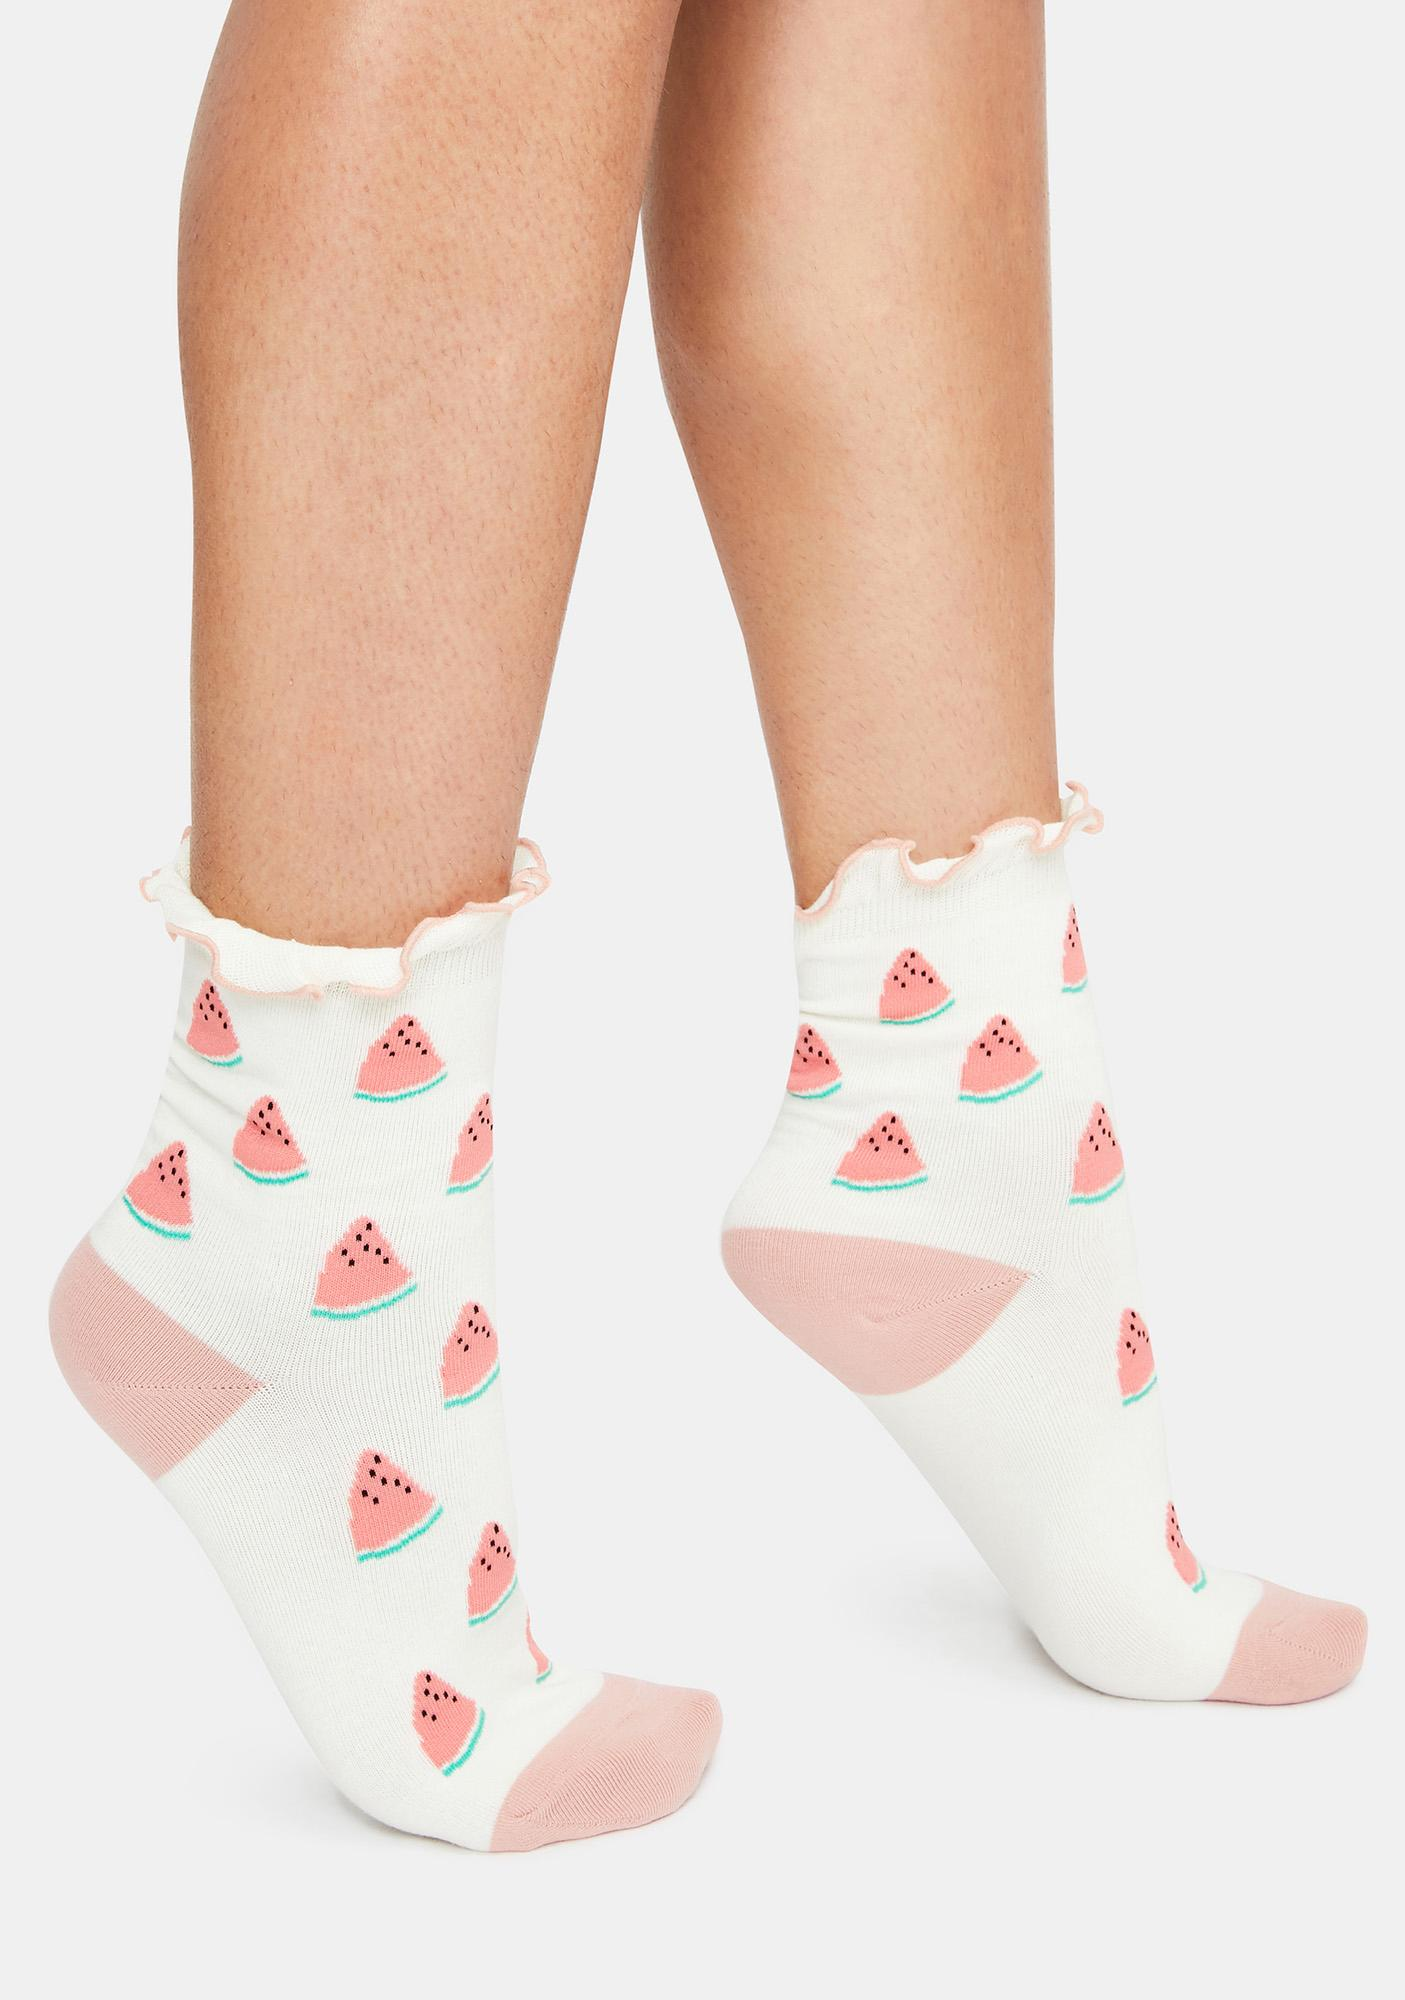 I'm So Sweet Watermelon Socks